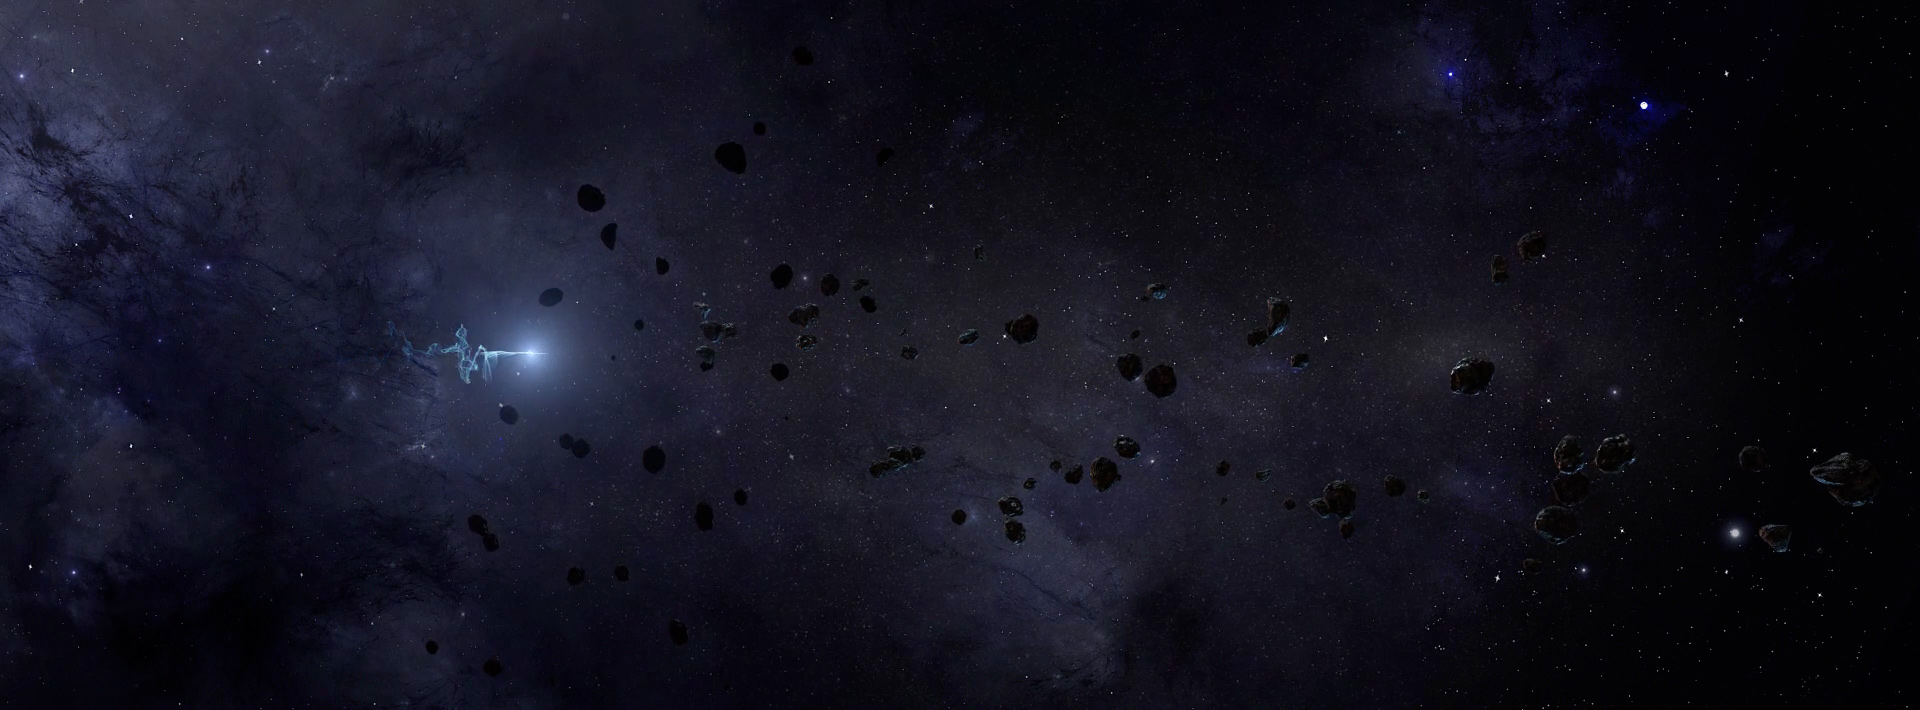 beautifully-shot-sci-fi-short-film-beyond-17.jpg